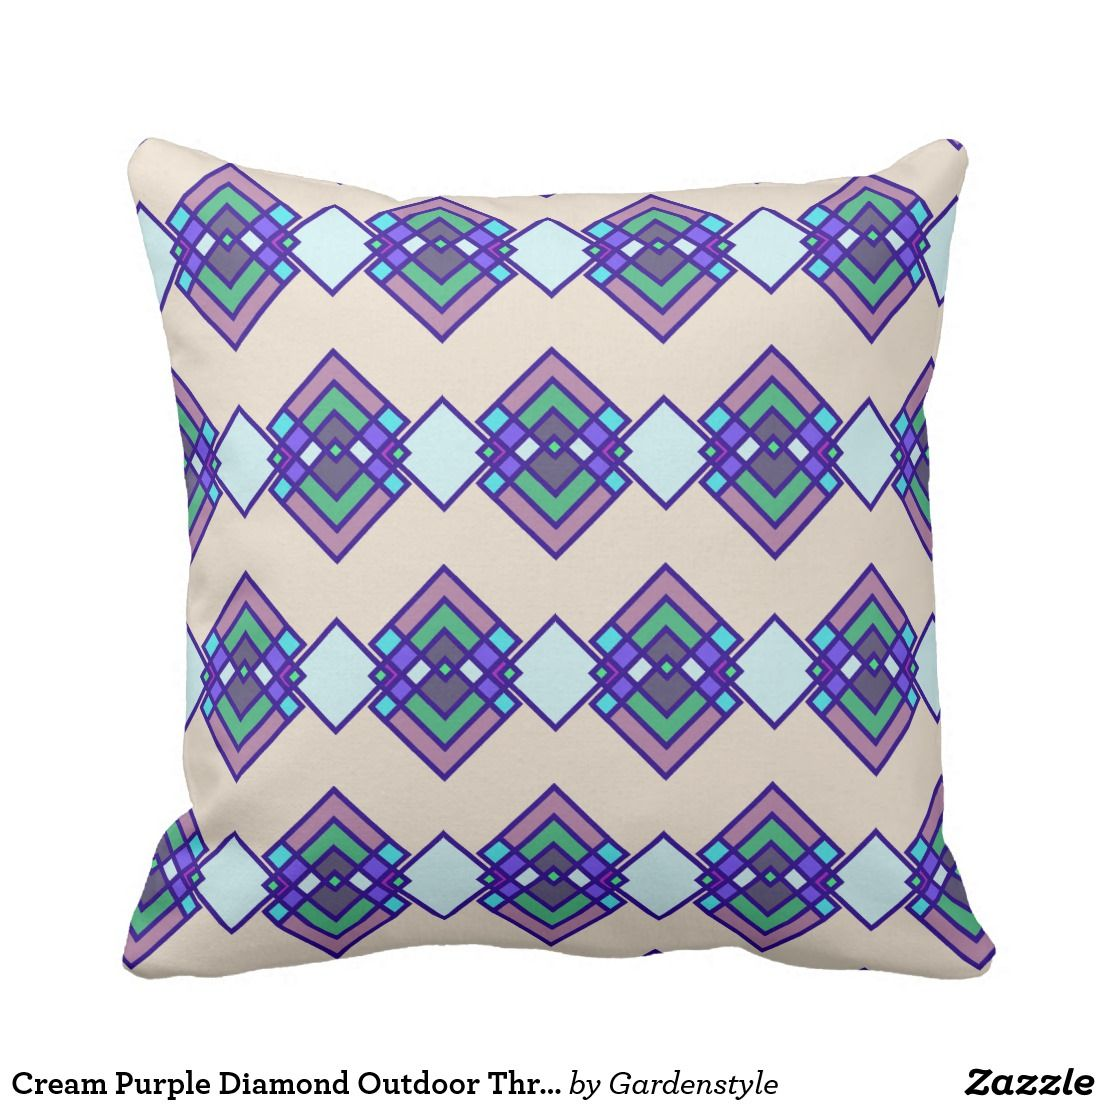 Cream Purple Diamond Outdoor Throw Pillow 16x16 Zazzle Com With